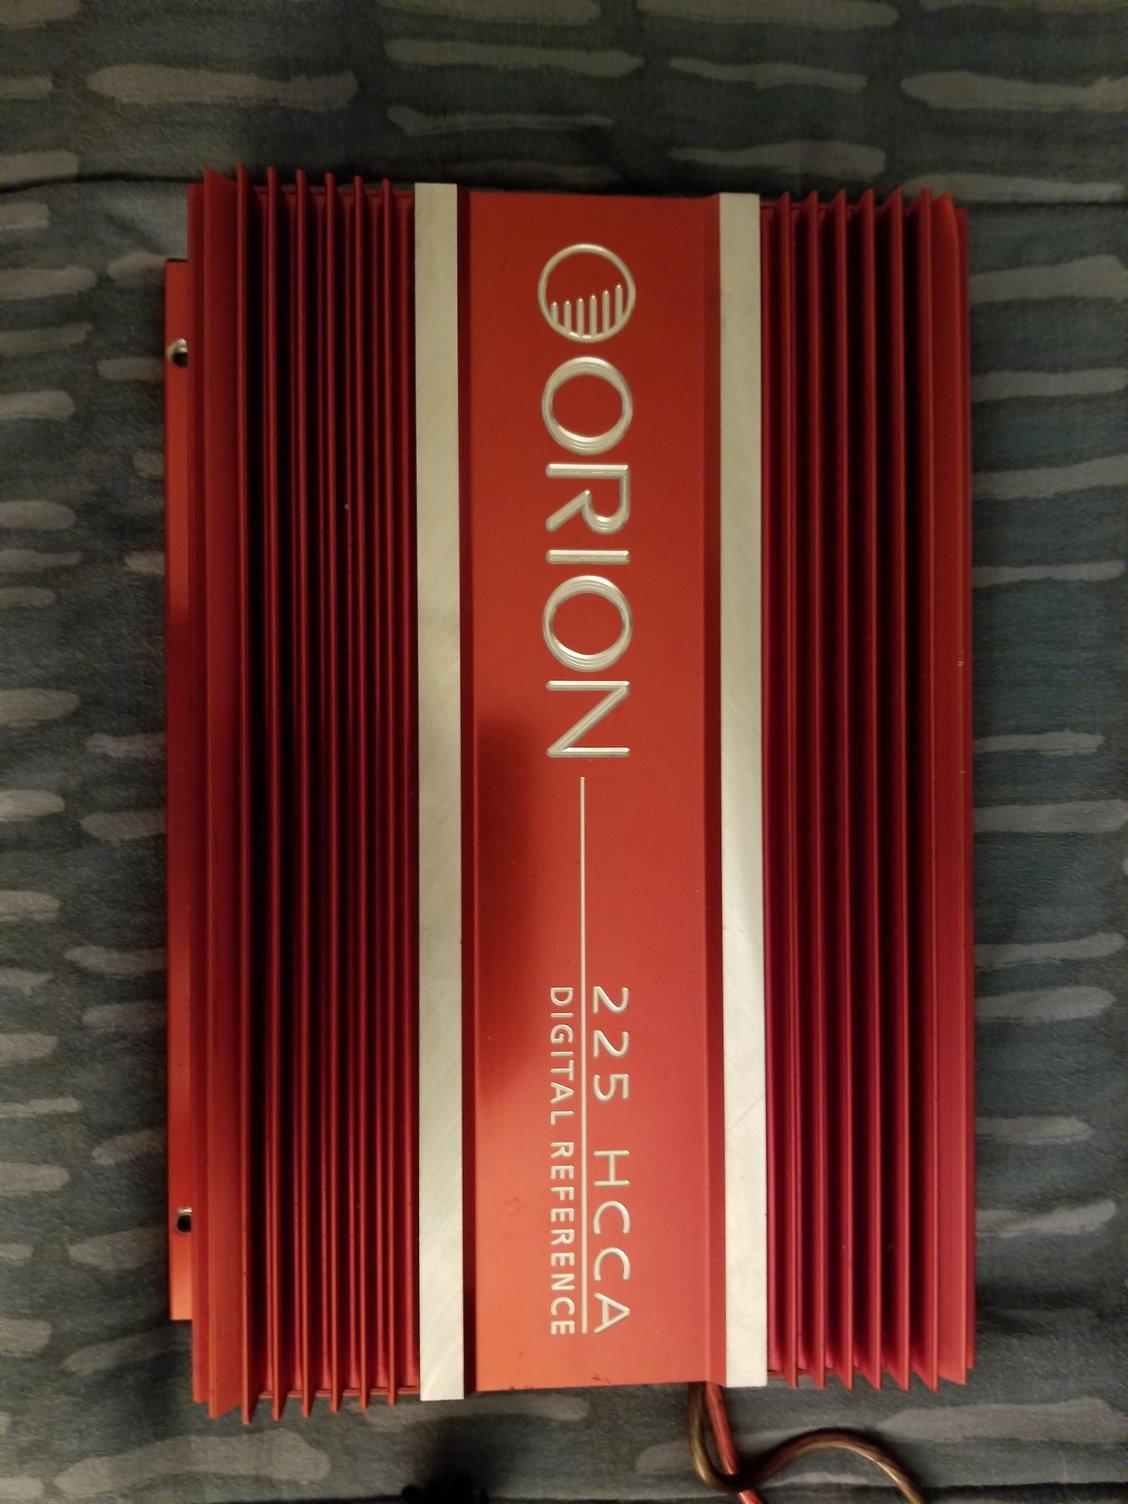 Orion HCCA 225 for sale - Car Audio Forumz - The #1 Car ...